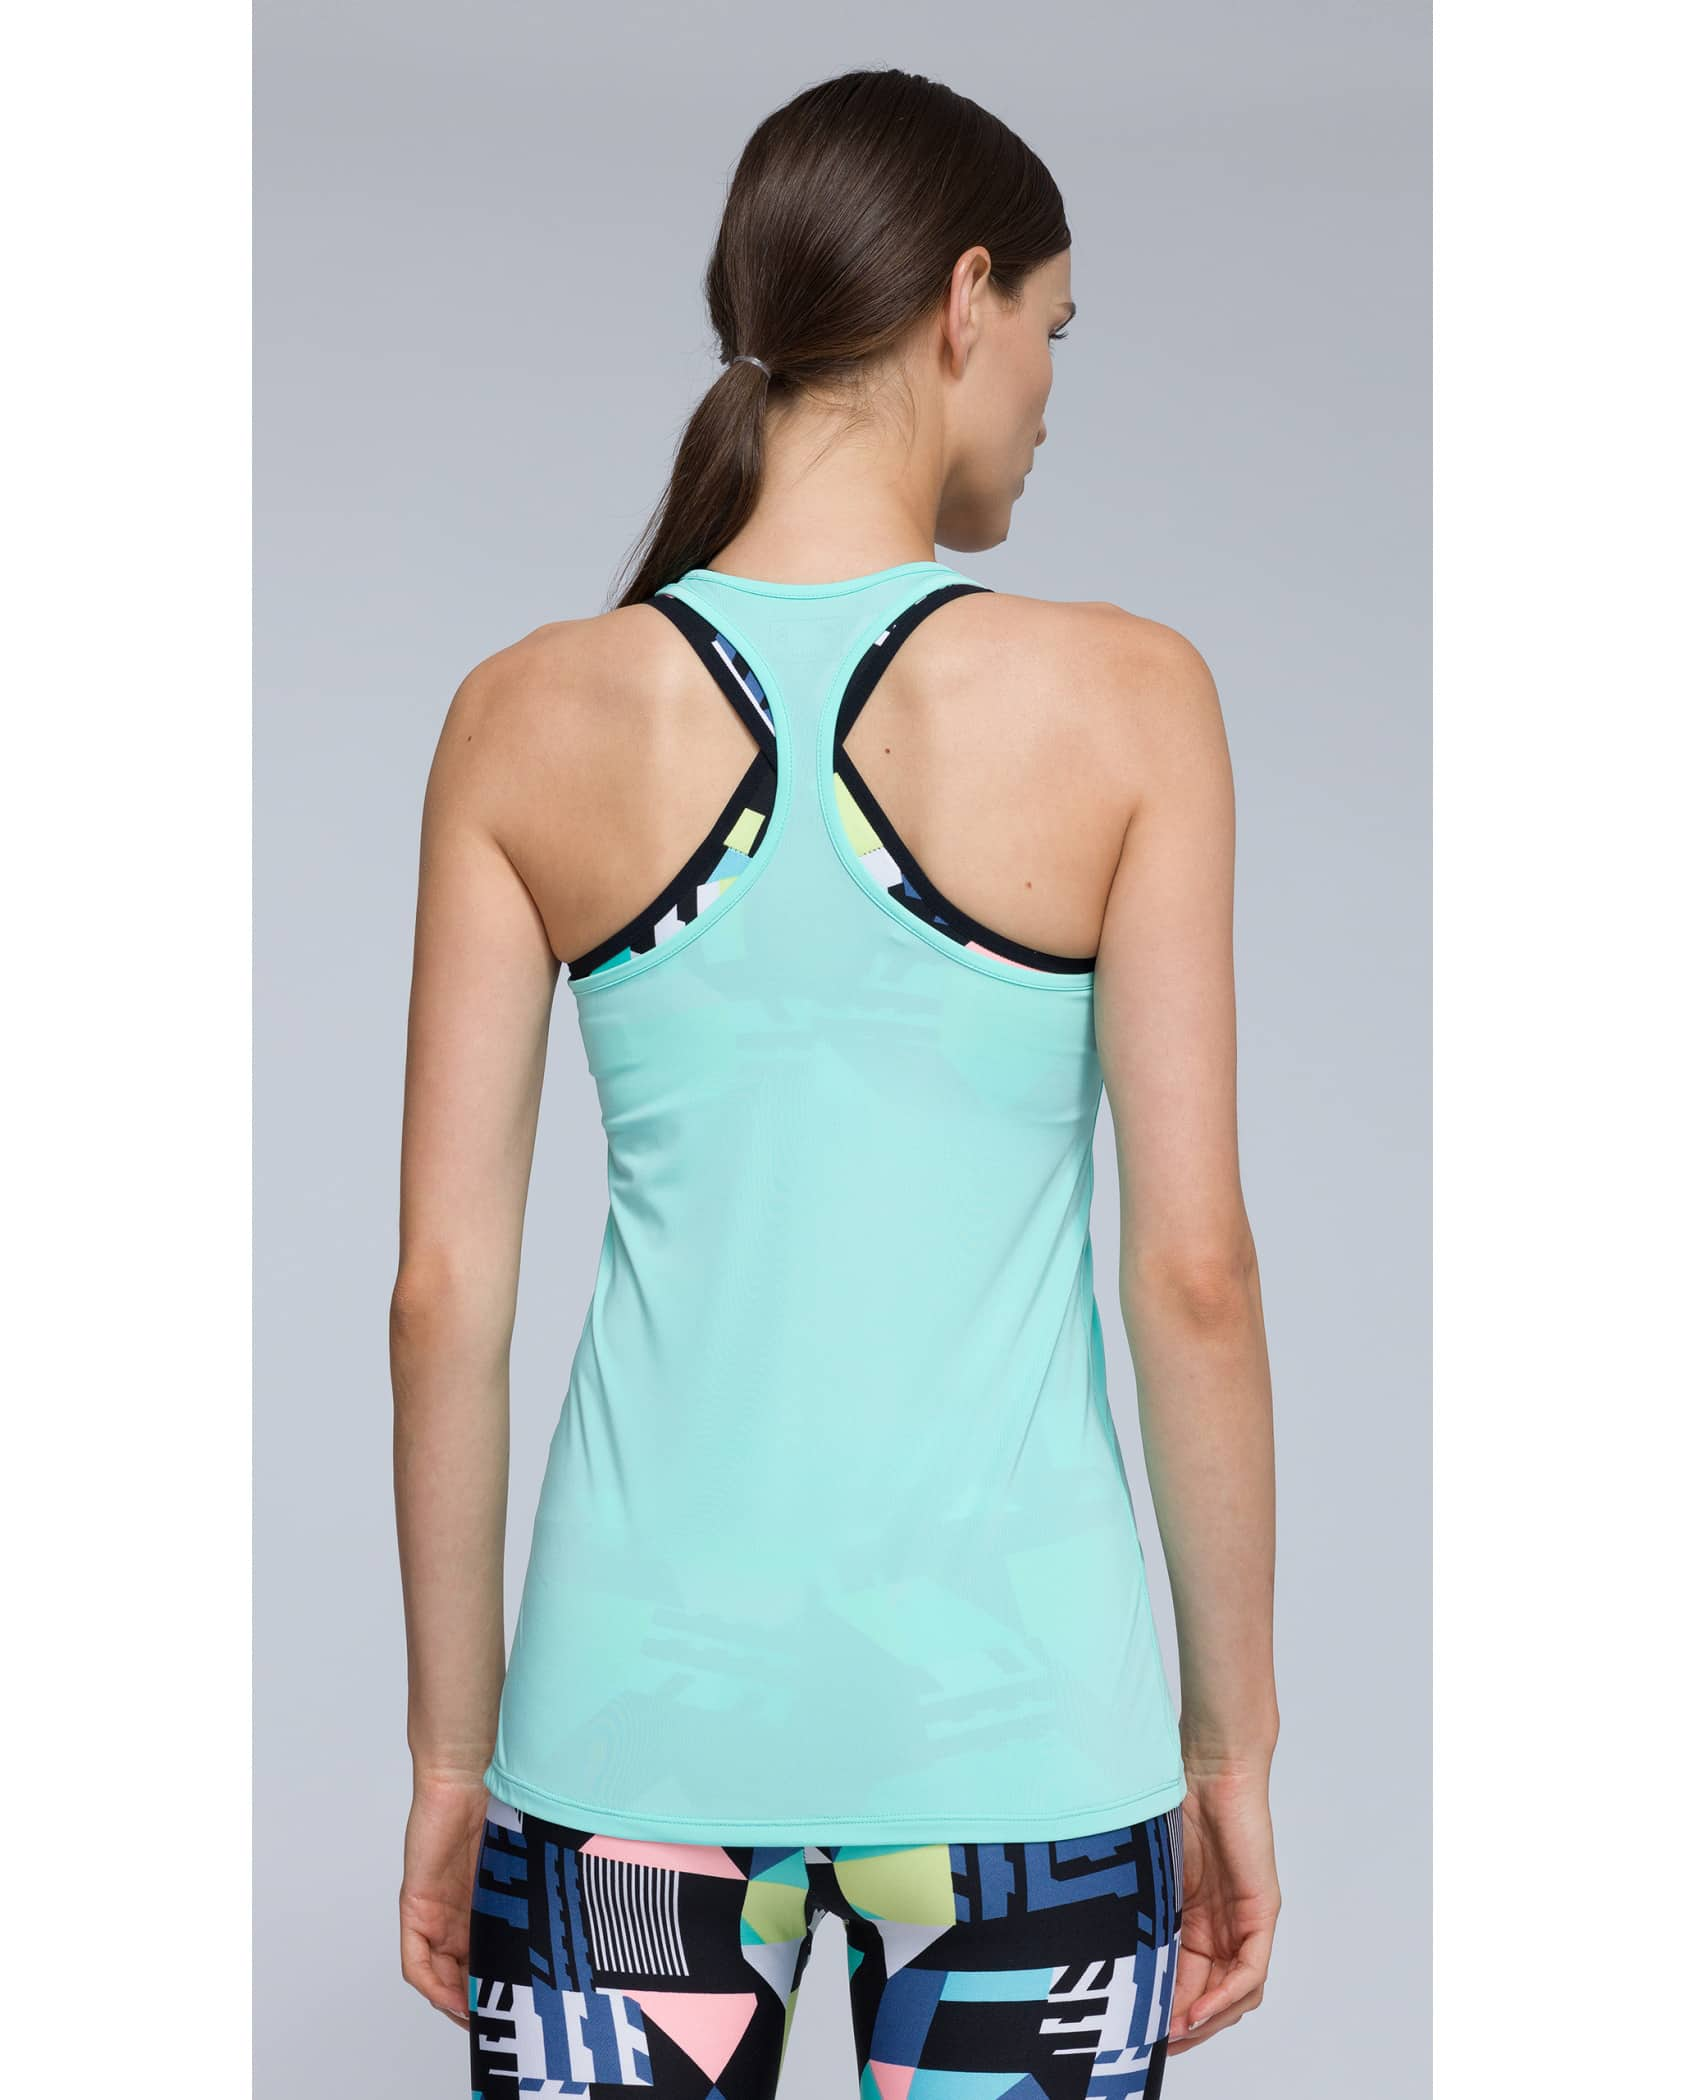 4F Women's Functional T-Shirt- Mint